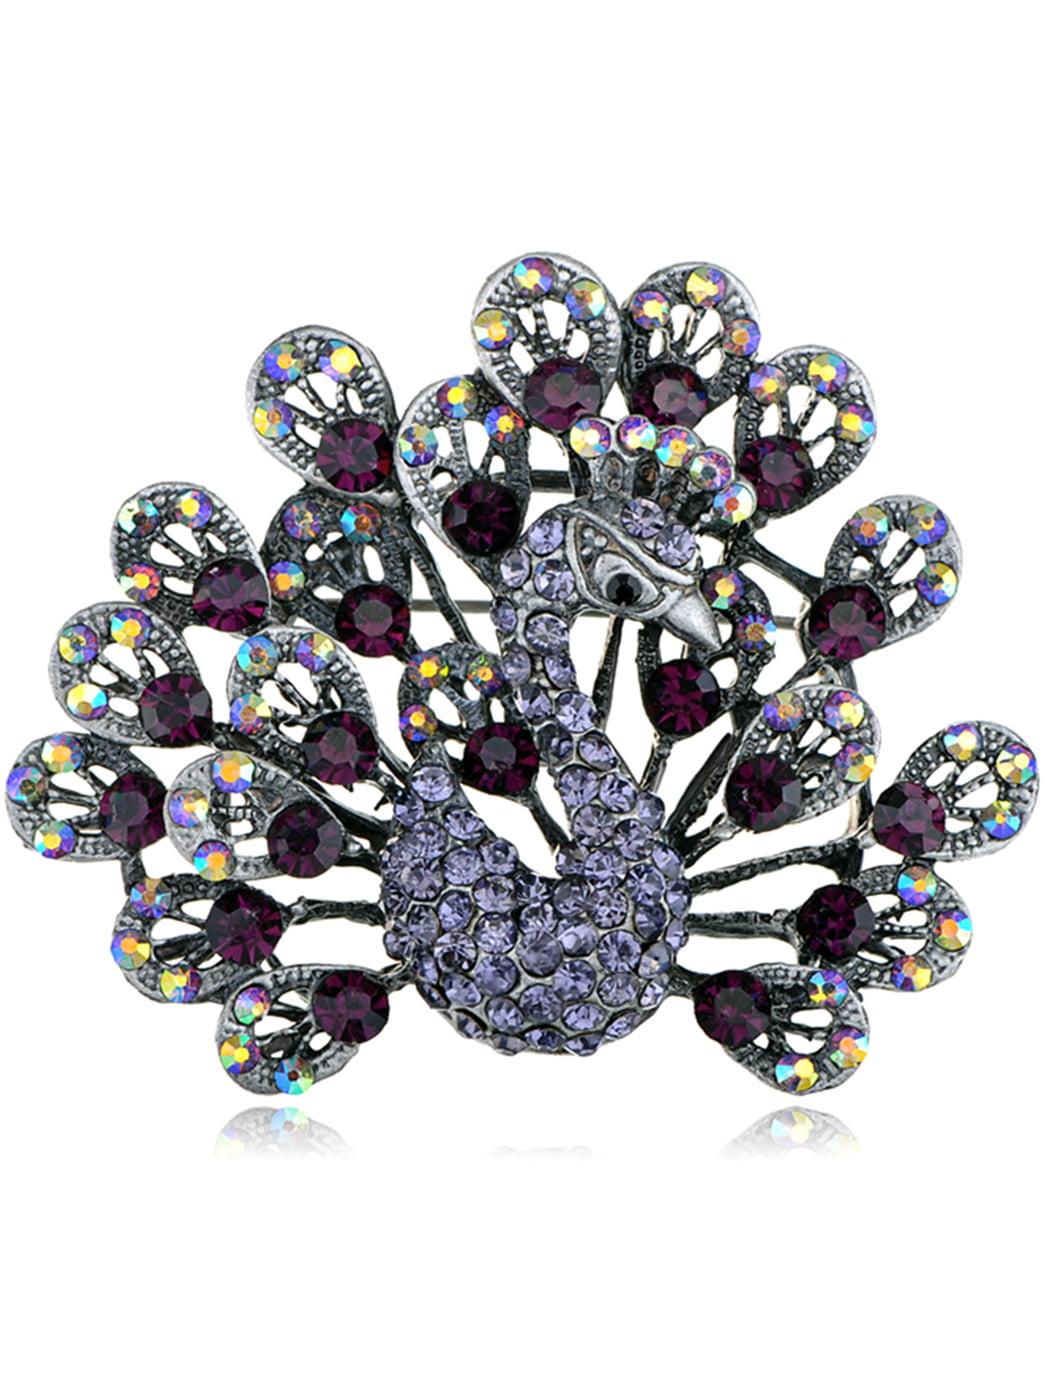 Dark Purple Crystal Rhinestone Peafowl Tail Feathers Peacock Brooch Pin by